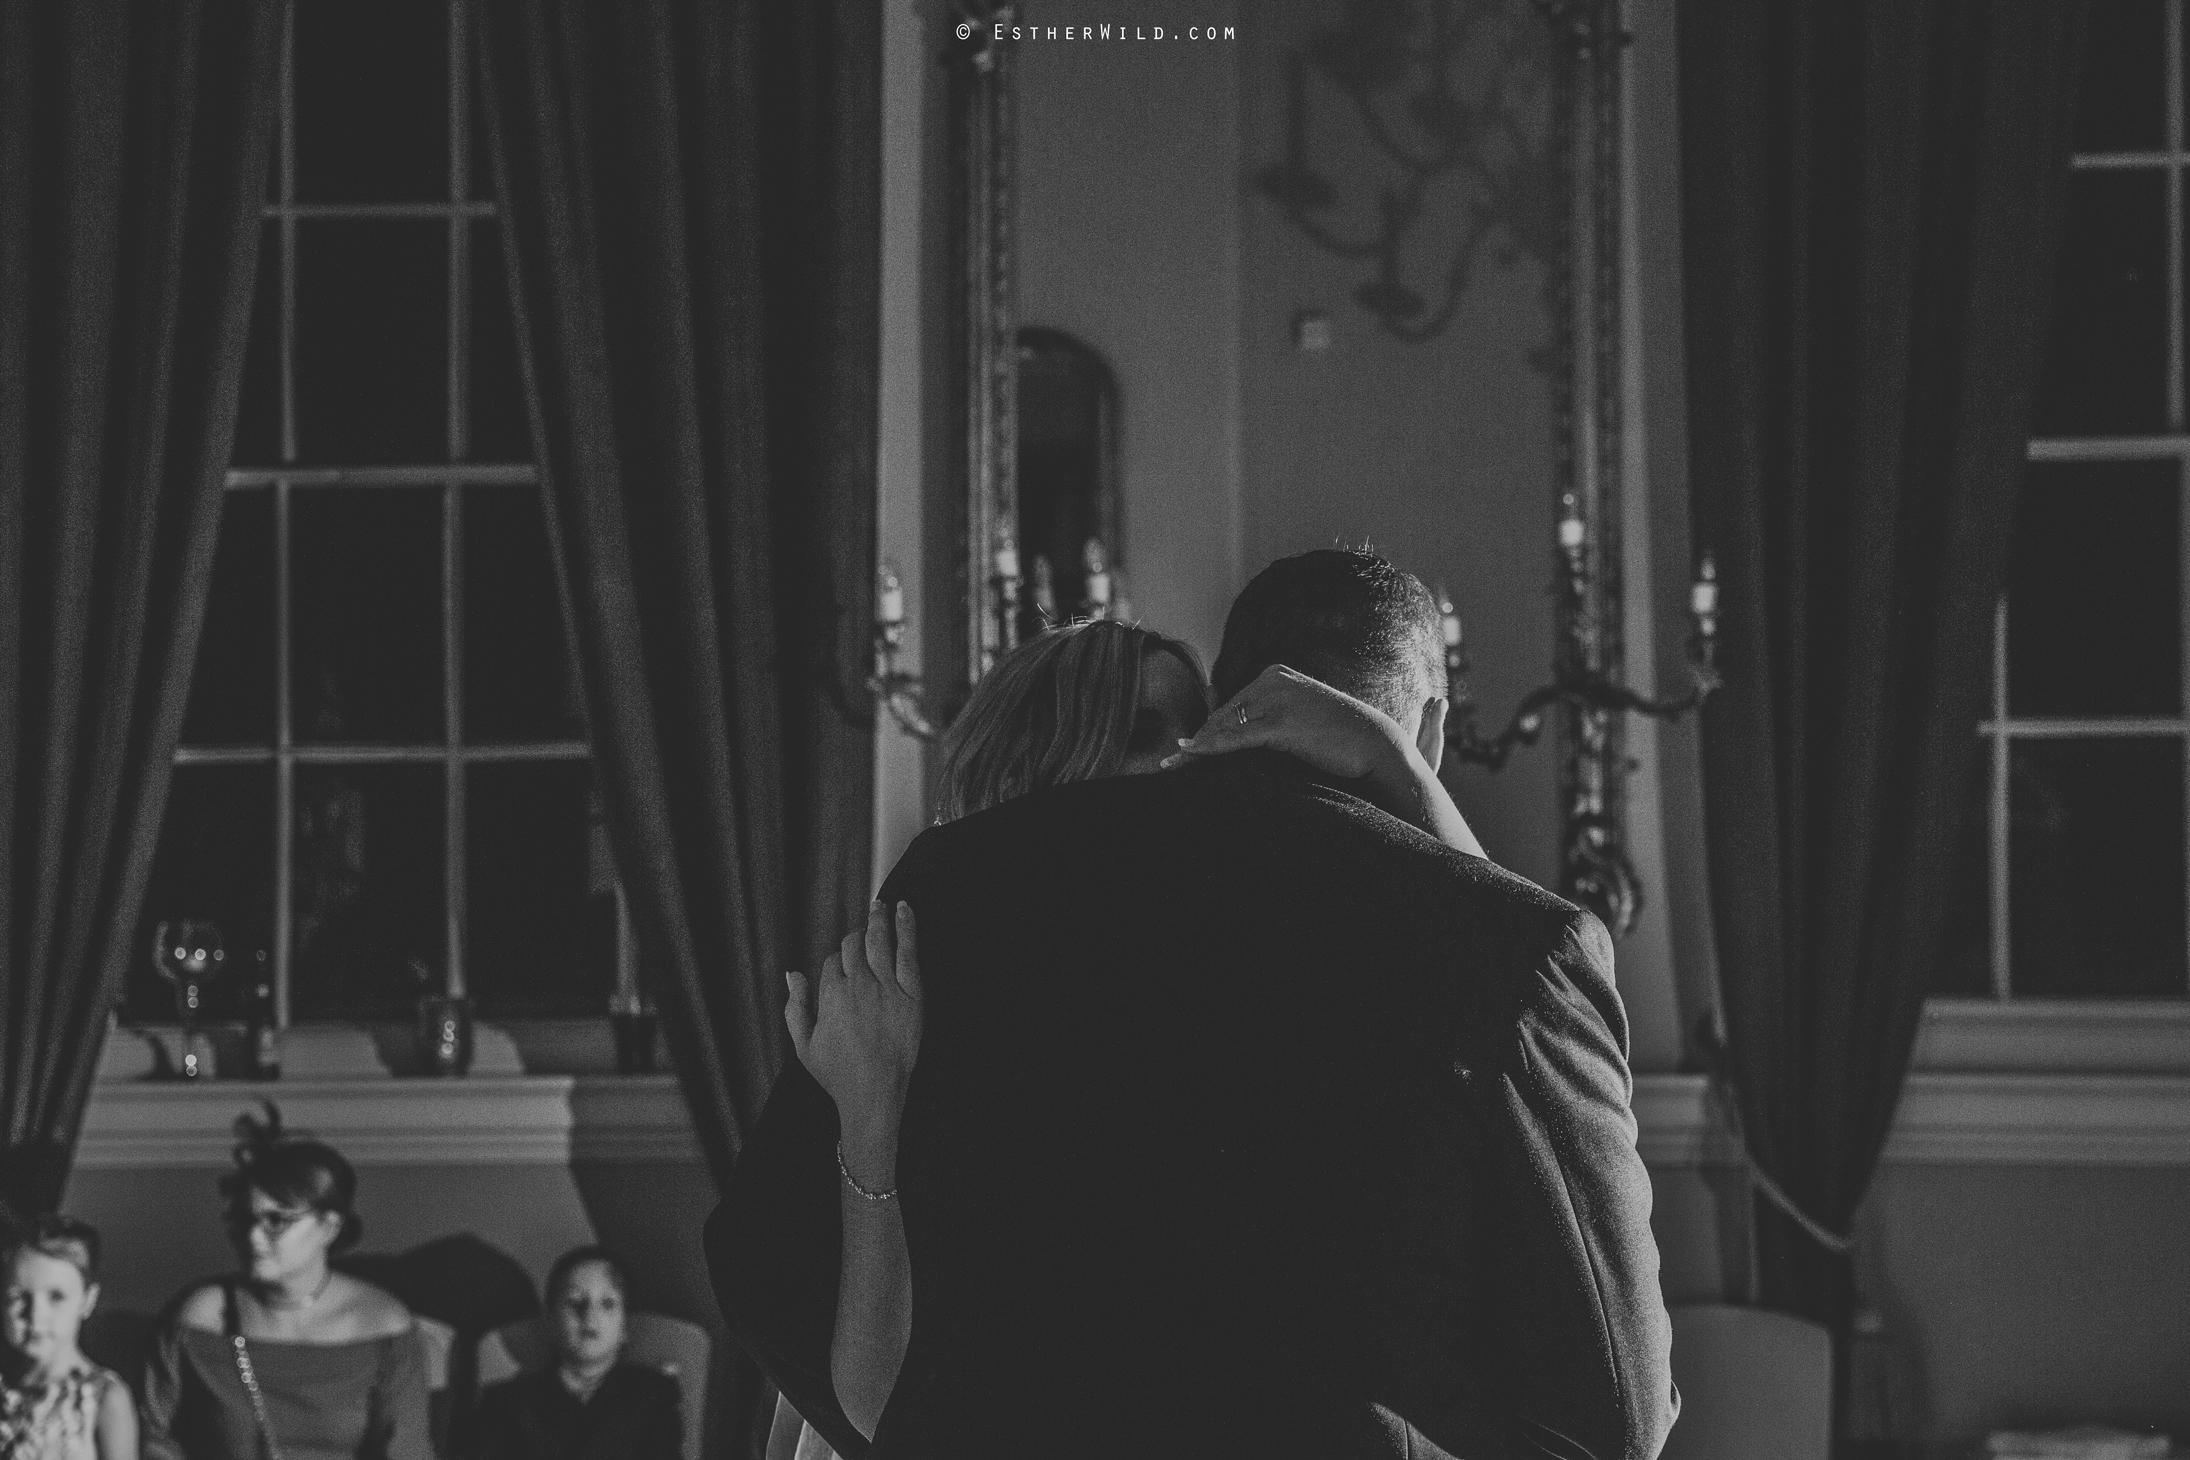 Wedding_Kings_Lynn_Town_Hall_Norfolk_Photographer_Esther_Wild_IMG_1825_IMGL0804.jpg